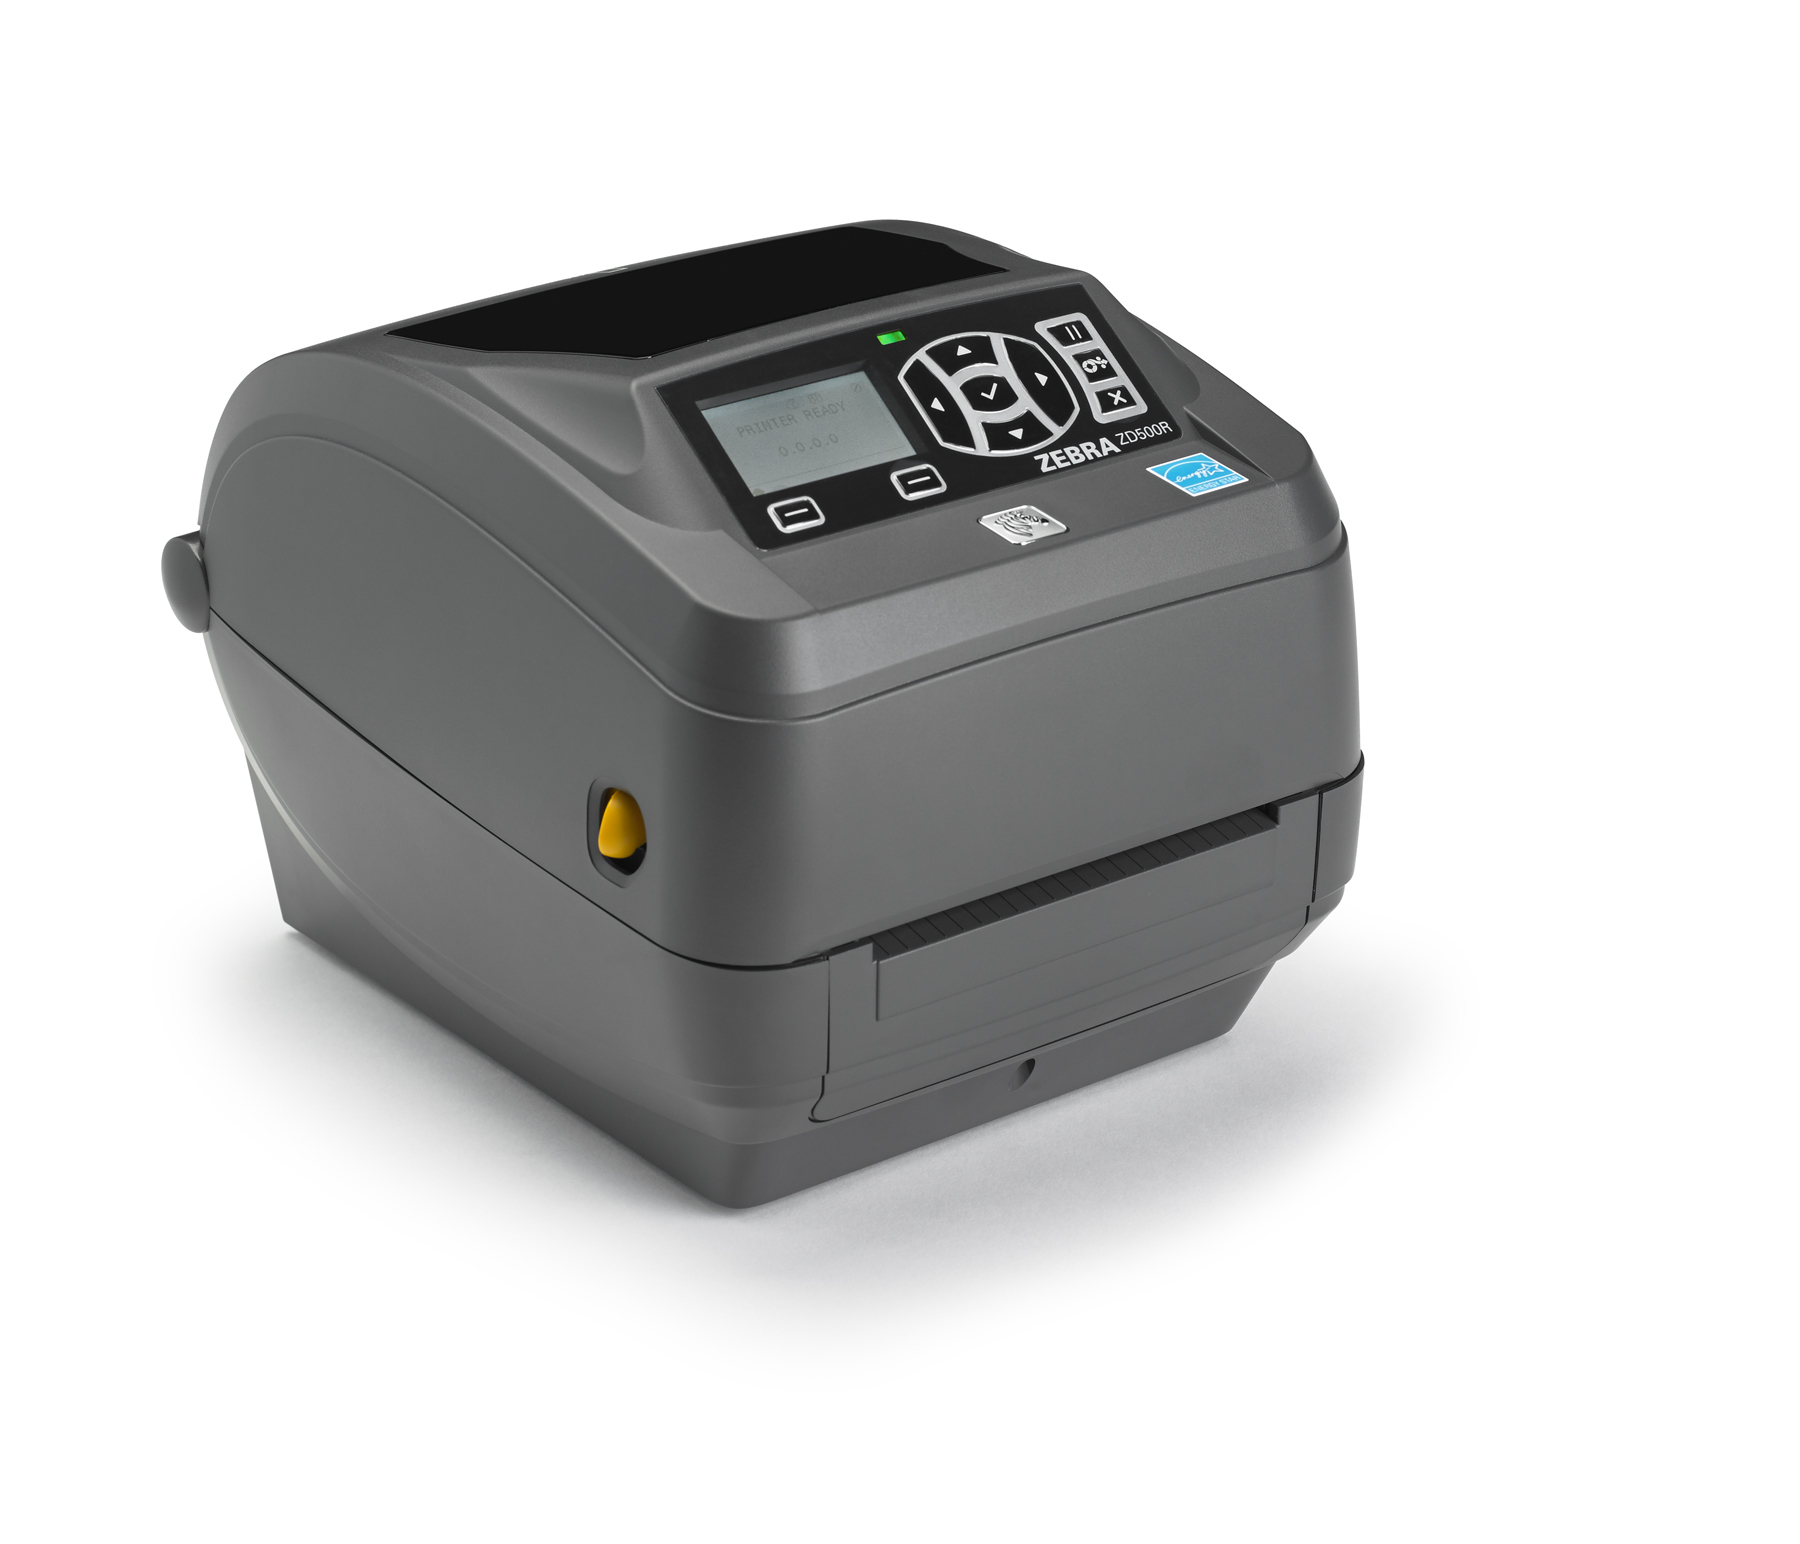 Zebra ZD500R impresora de etiquetas Térmica directa / transferencia térmica 203 x 203 DPI Inalámbrico y alámbrico